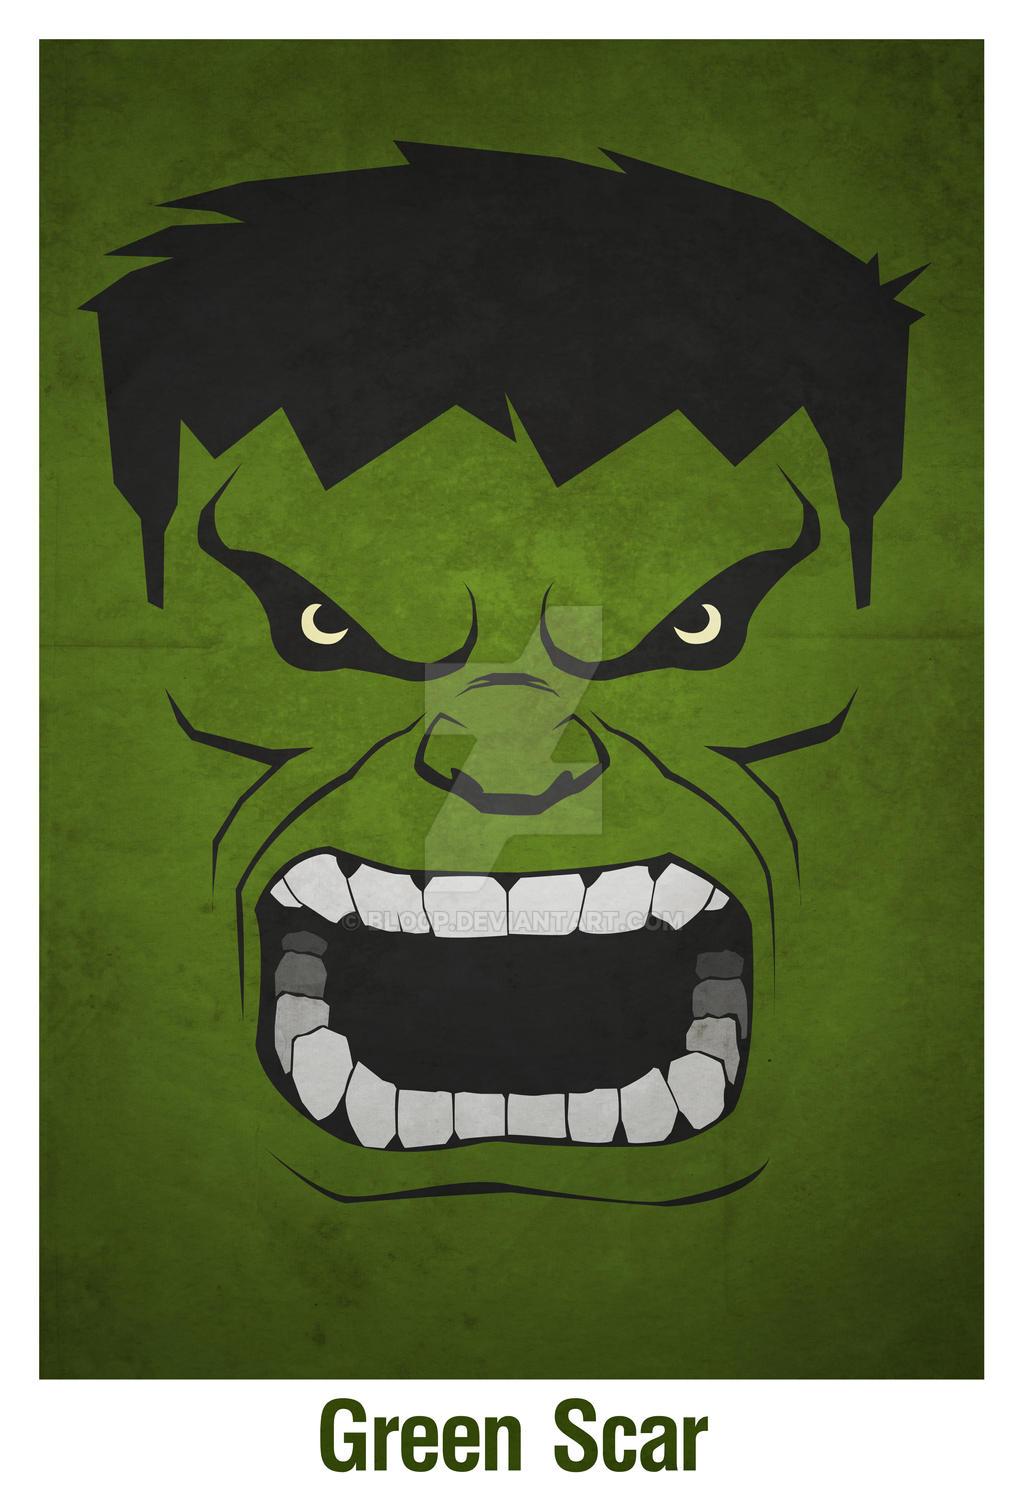 Green Scar By Blo0p On DeviantArt